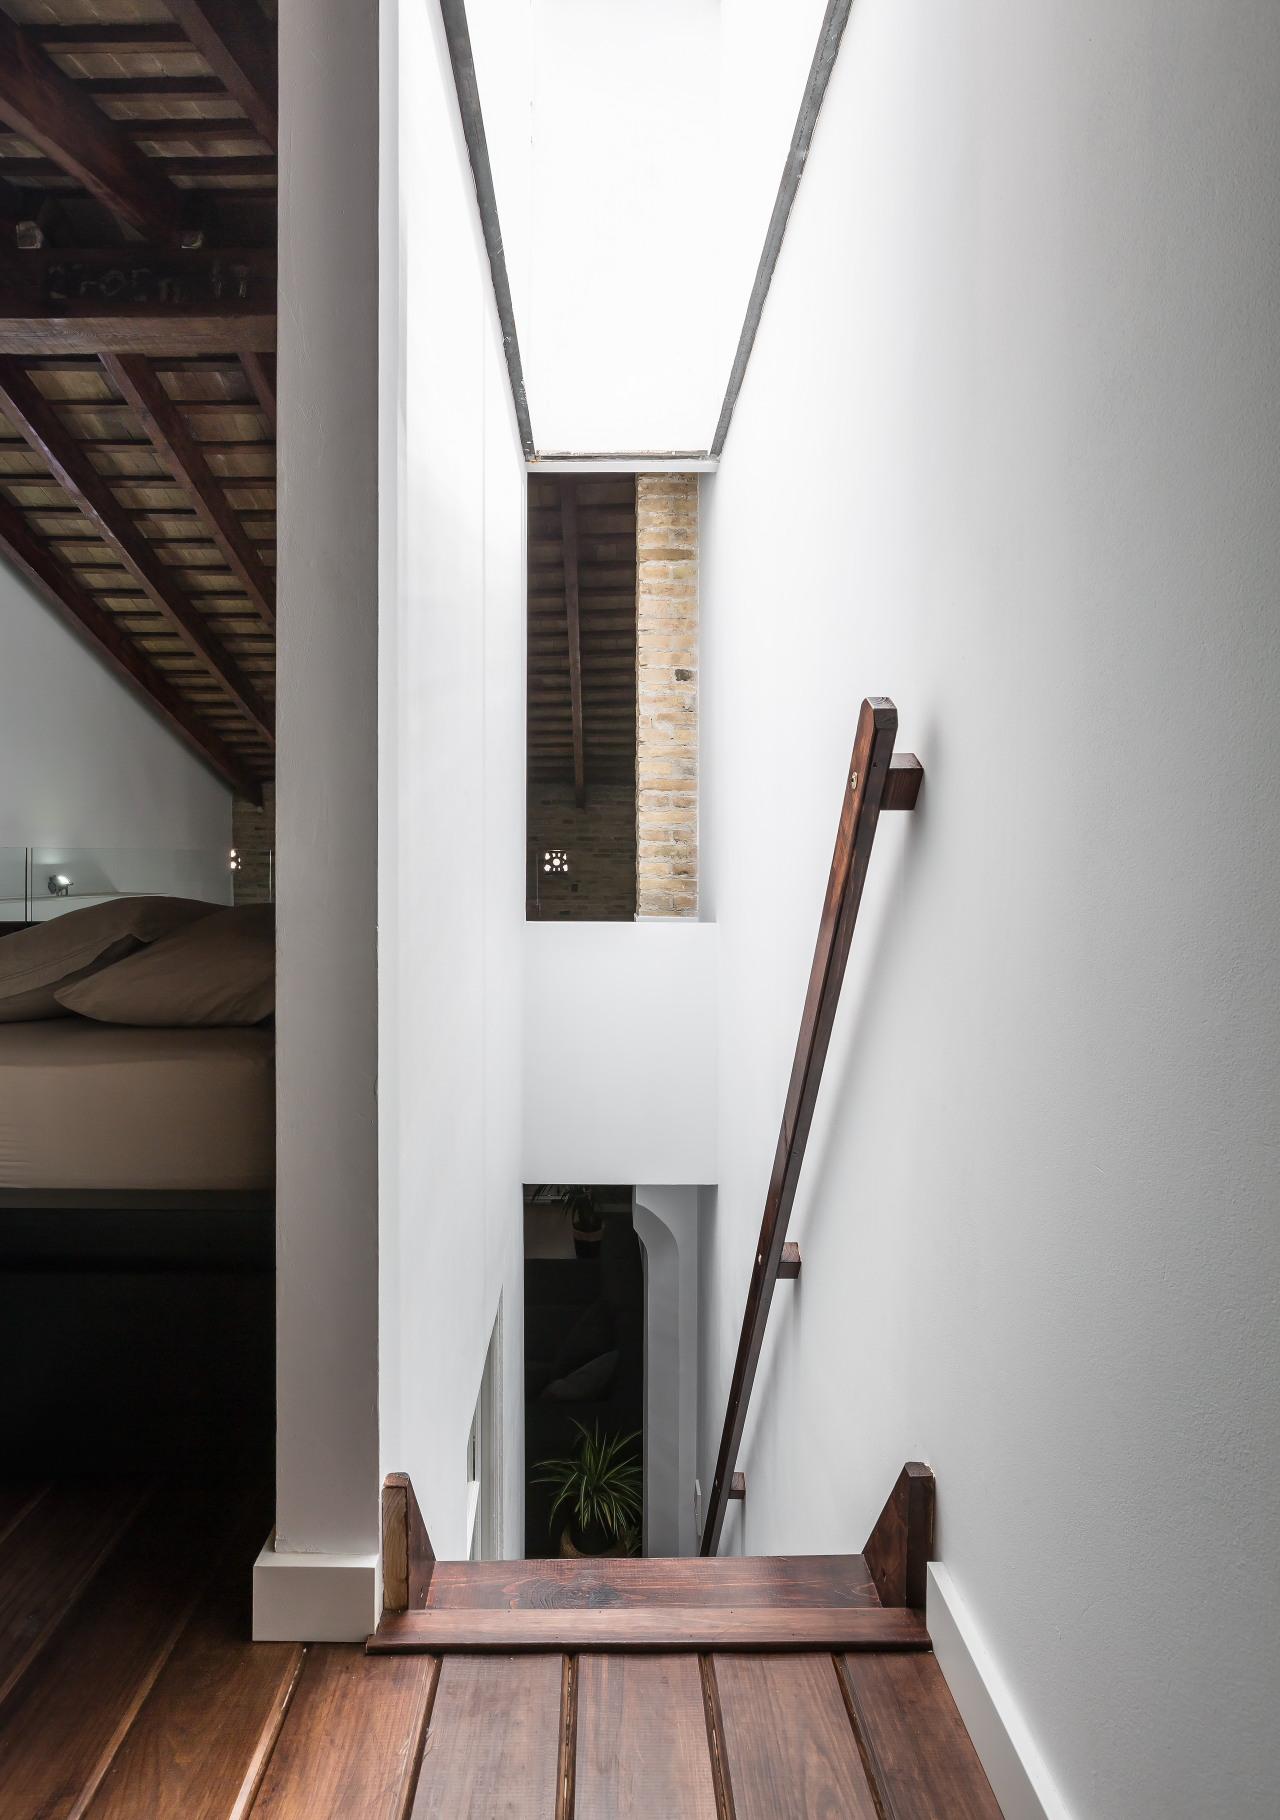 fotografia-arquitectura-valencia-german-cabo-ambau-cabanyal (19)